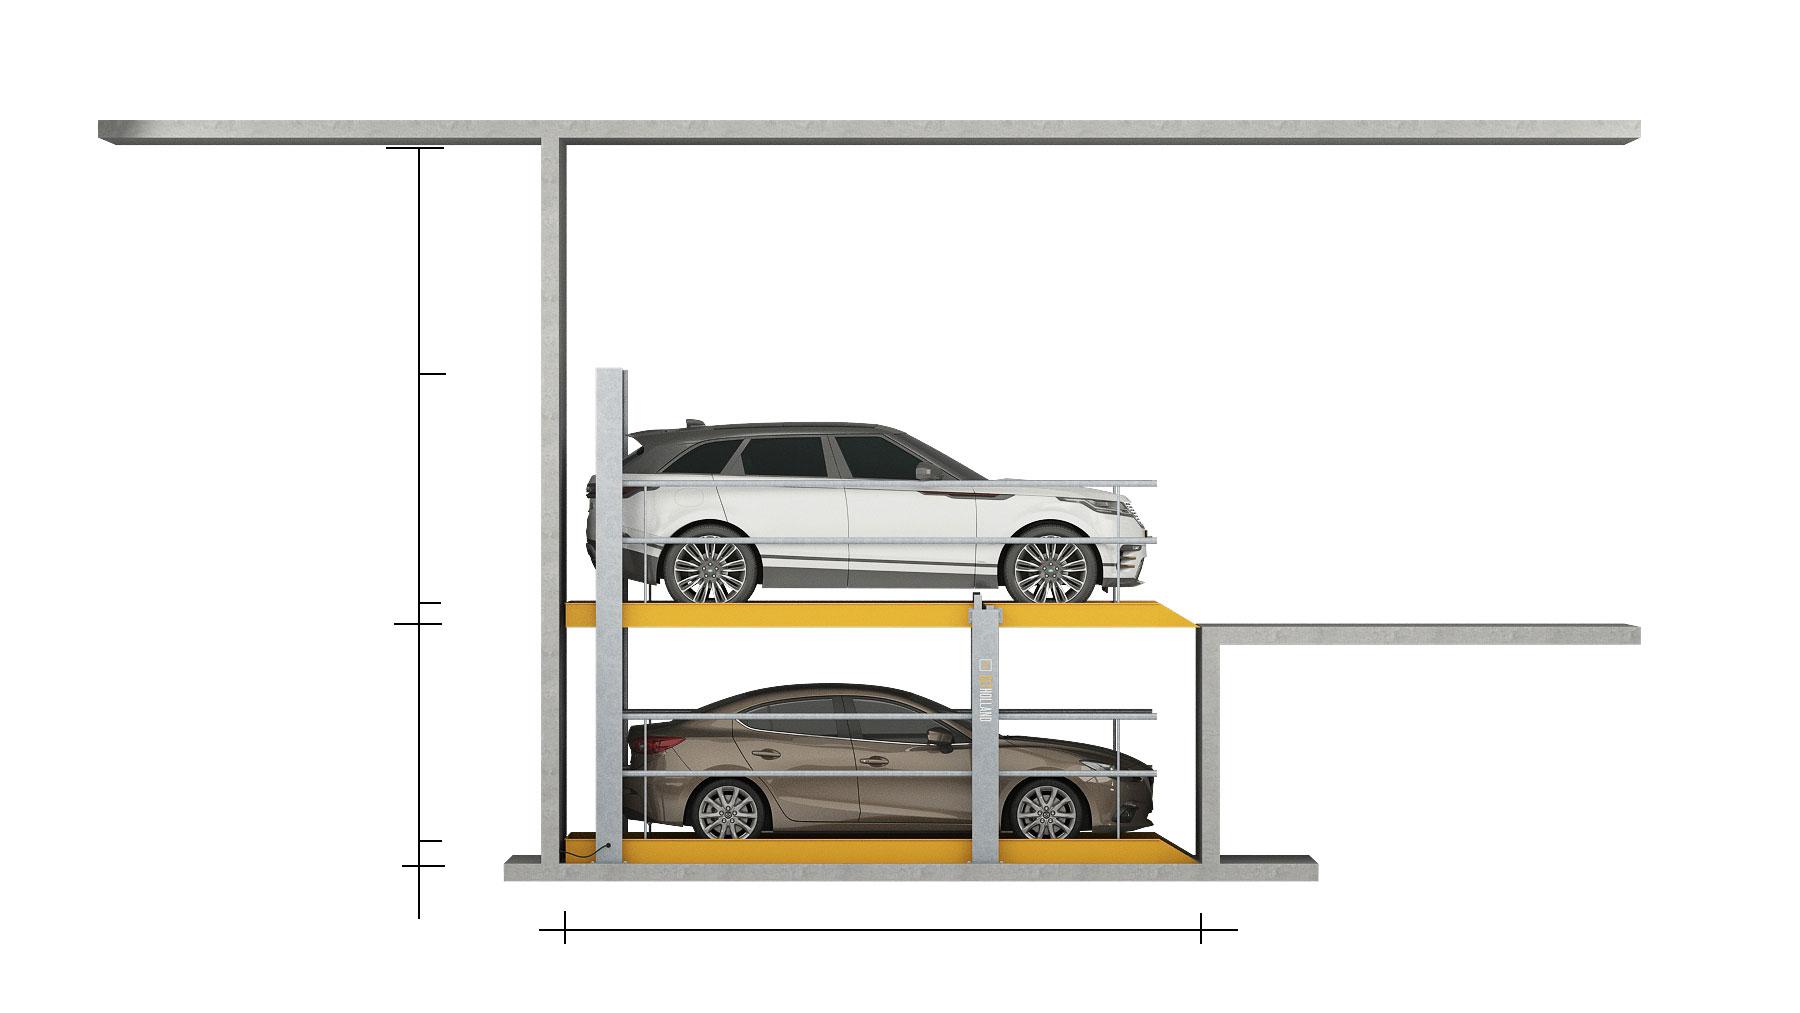 parkeerlift parkeernorm autolift parkeergarage